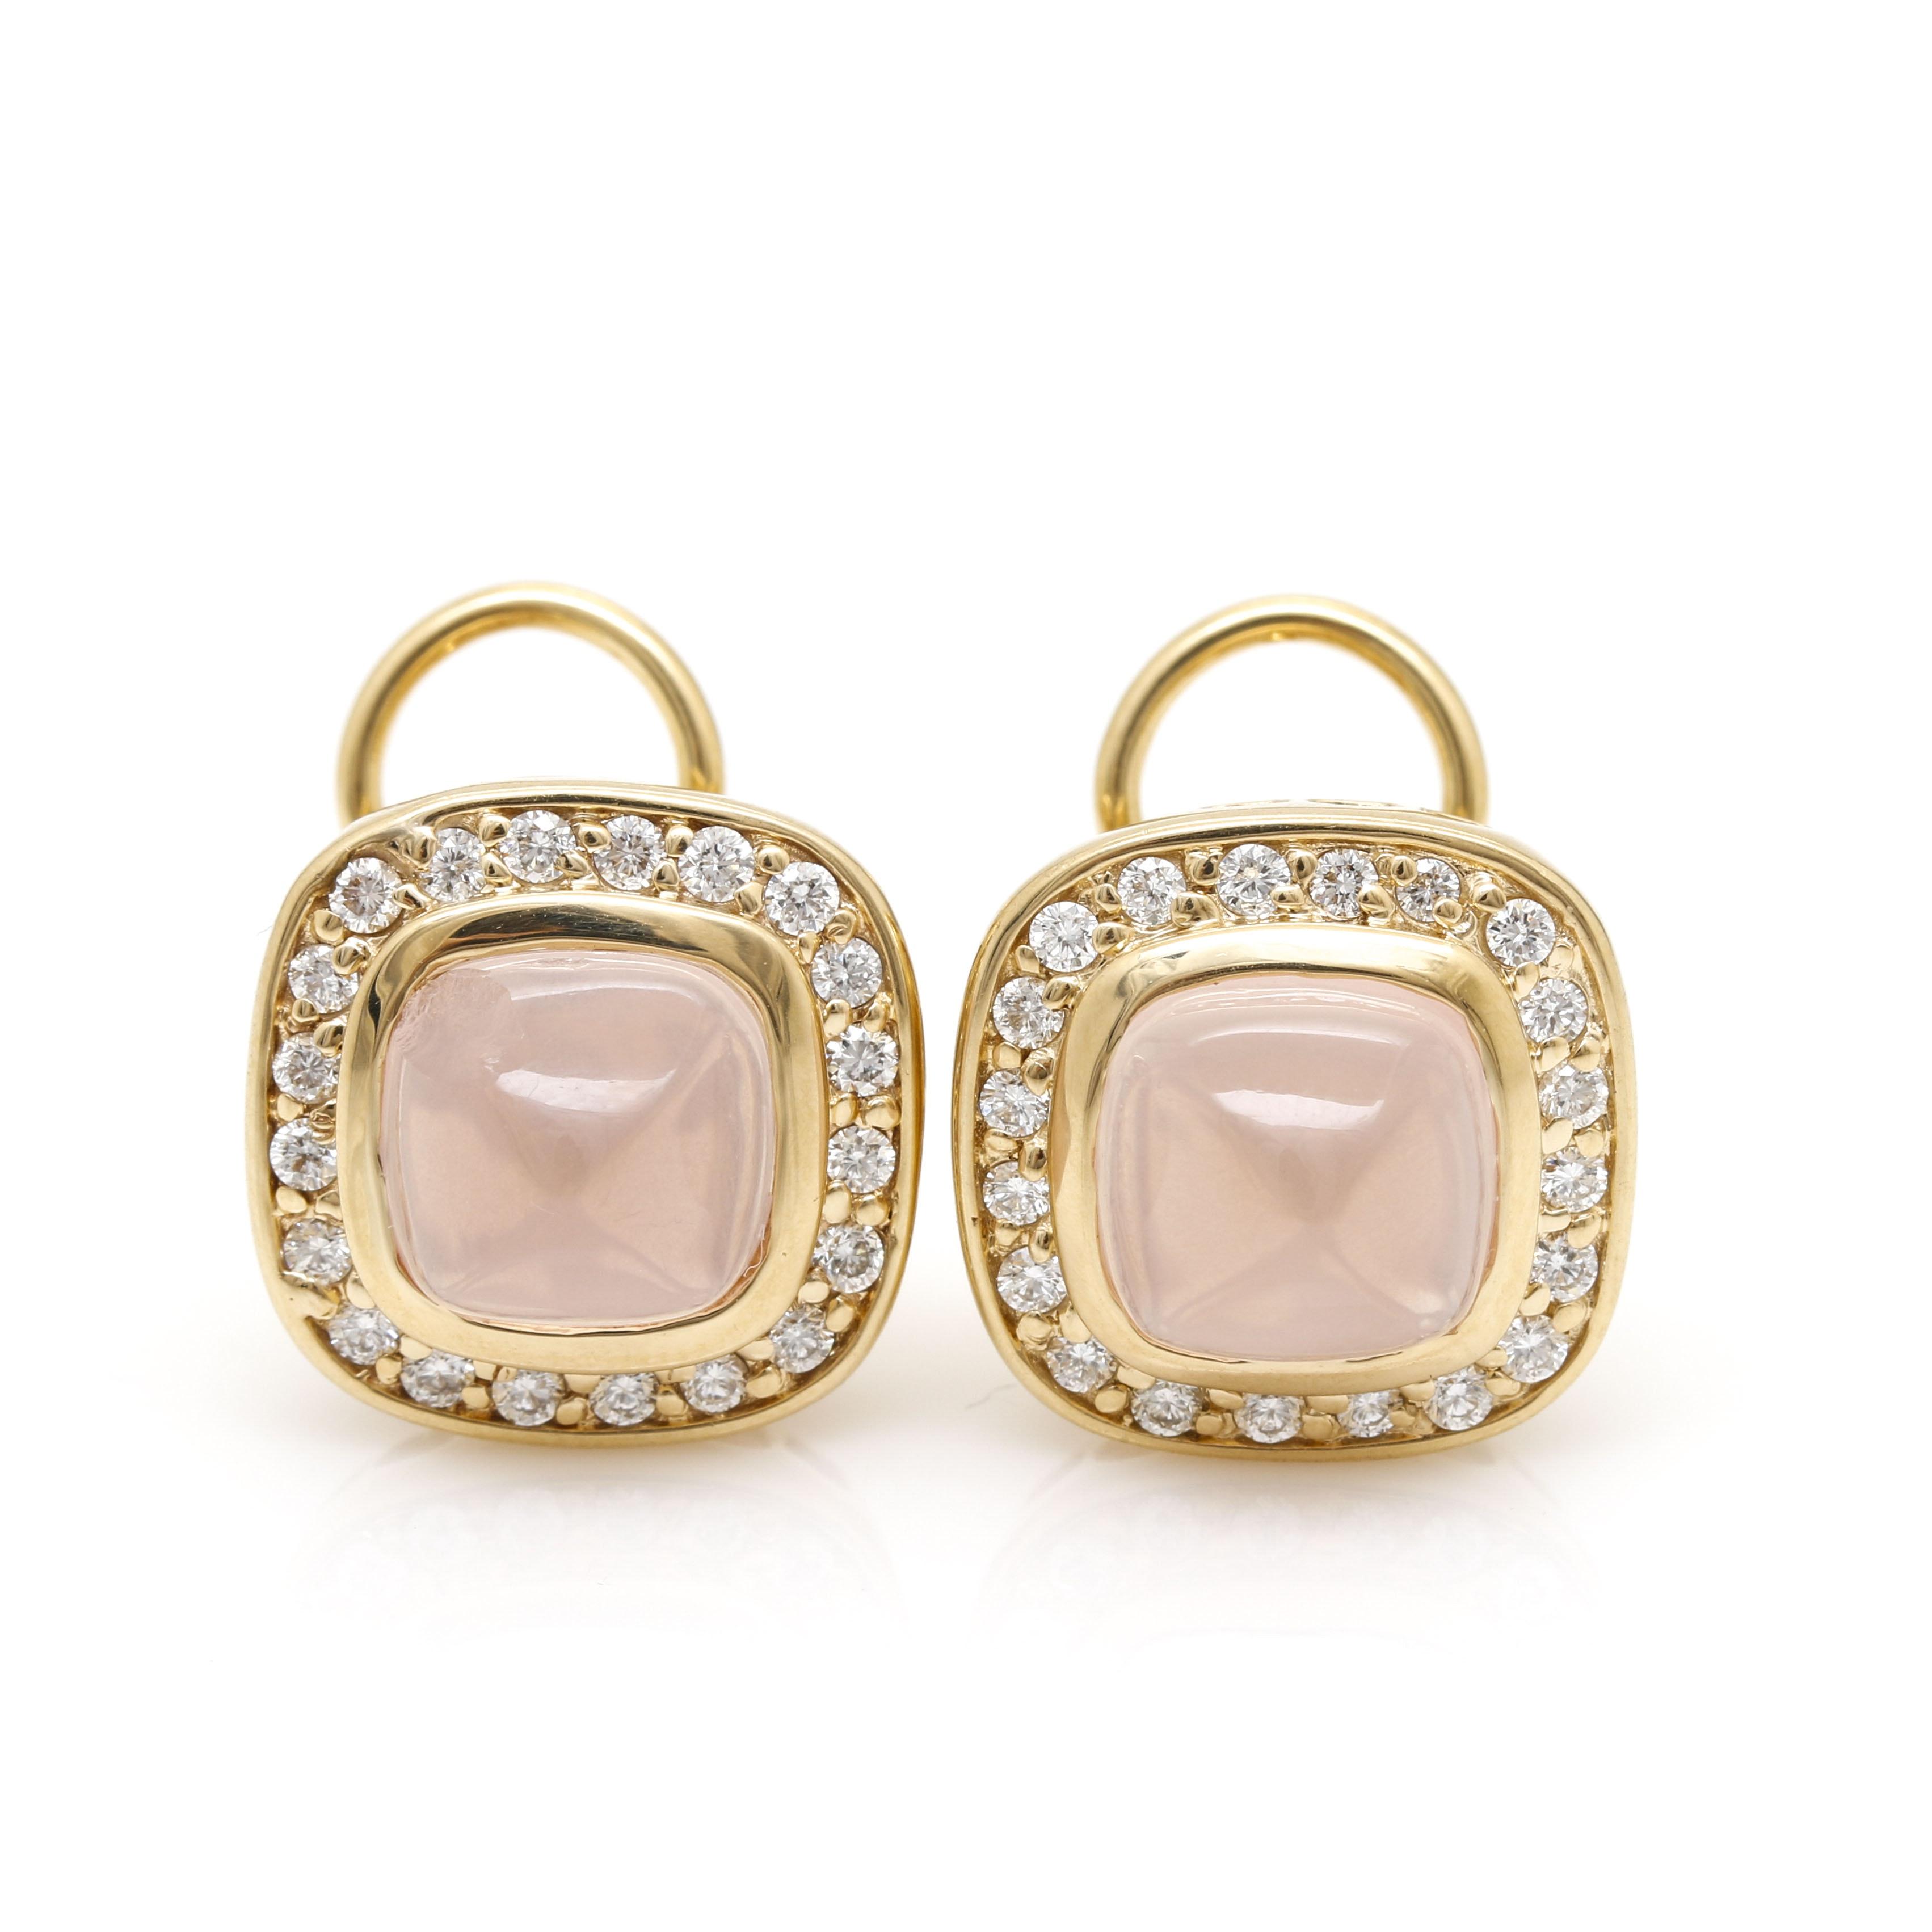 18K Yellow Gold Rose Quartz and Diamond Earrings